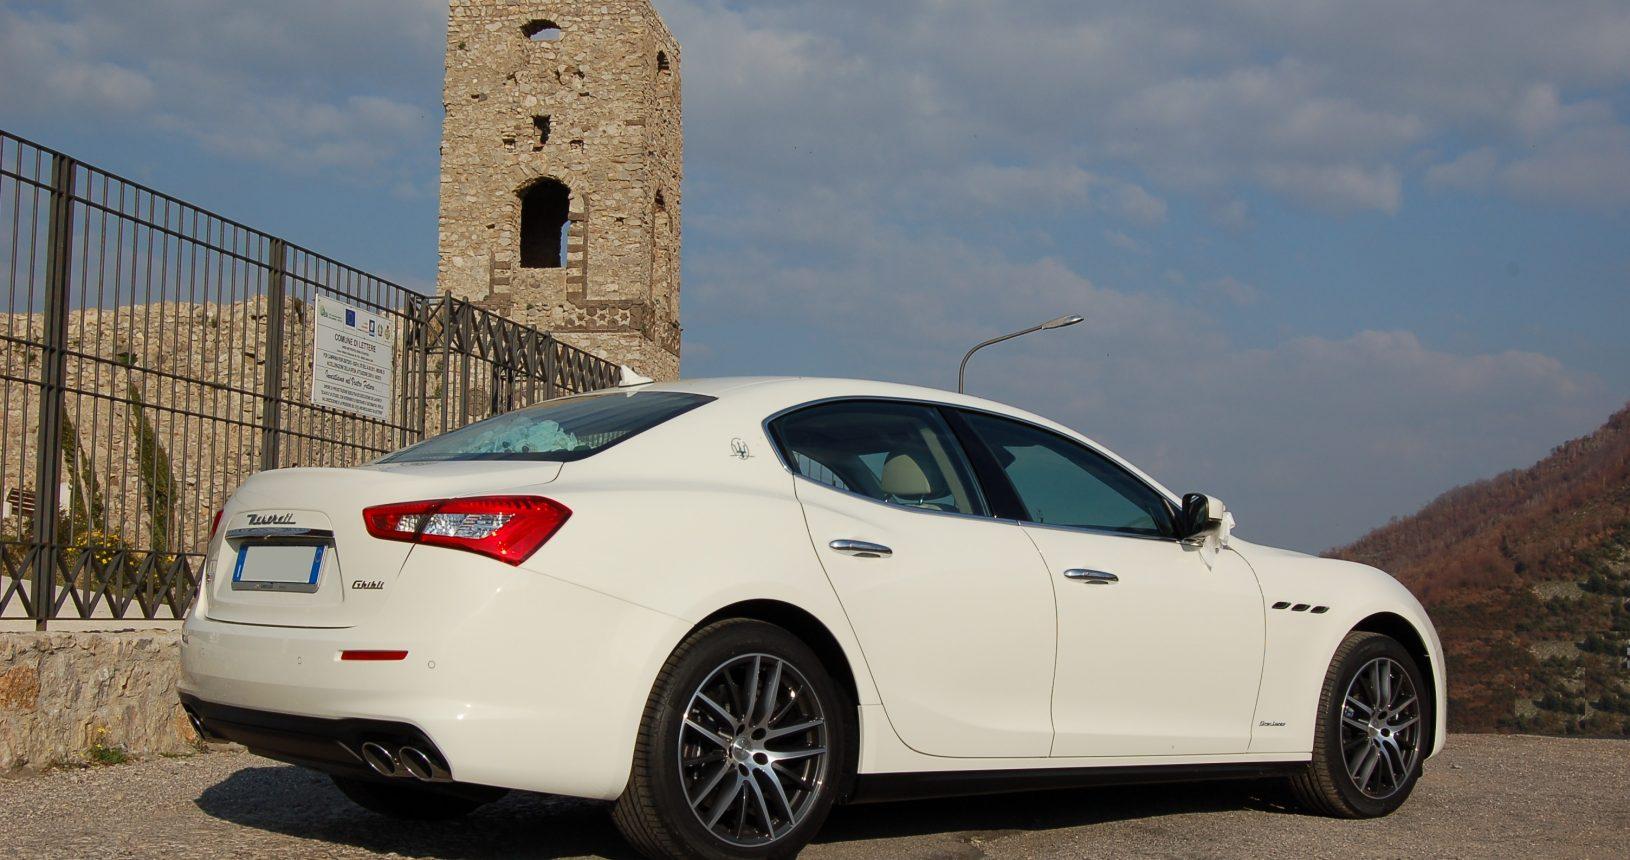 noleggio auto cerimonie Napoli | Maserati Ghibli bianca | auto sposi Napoli